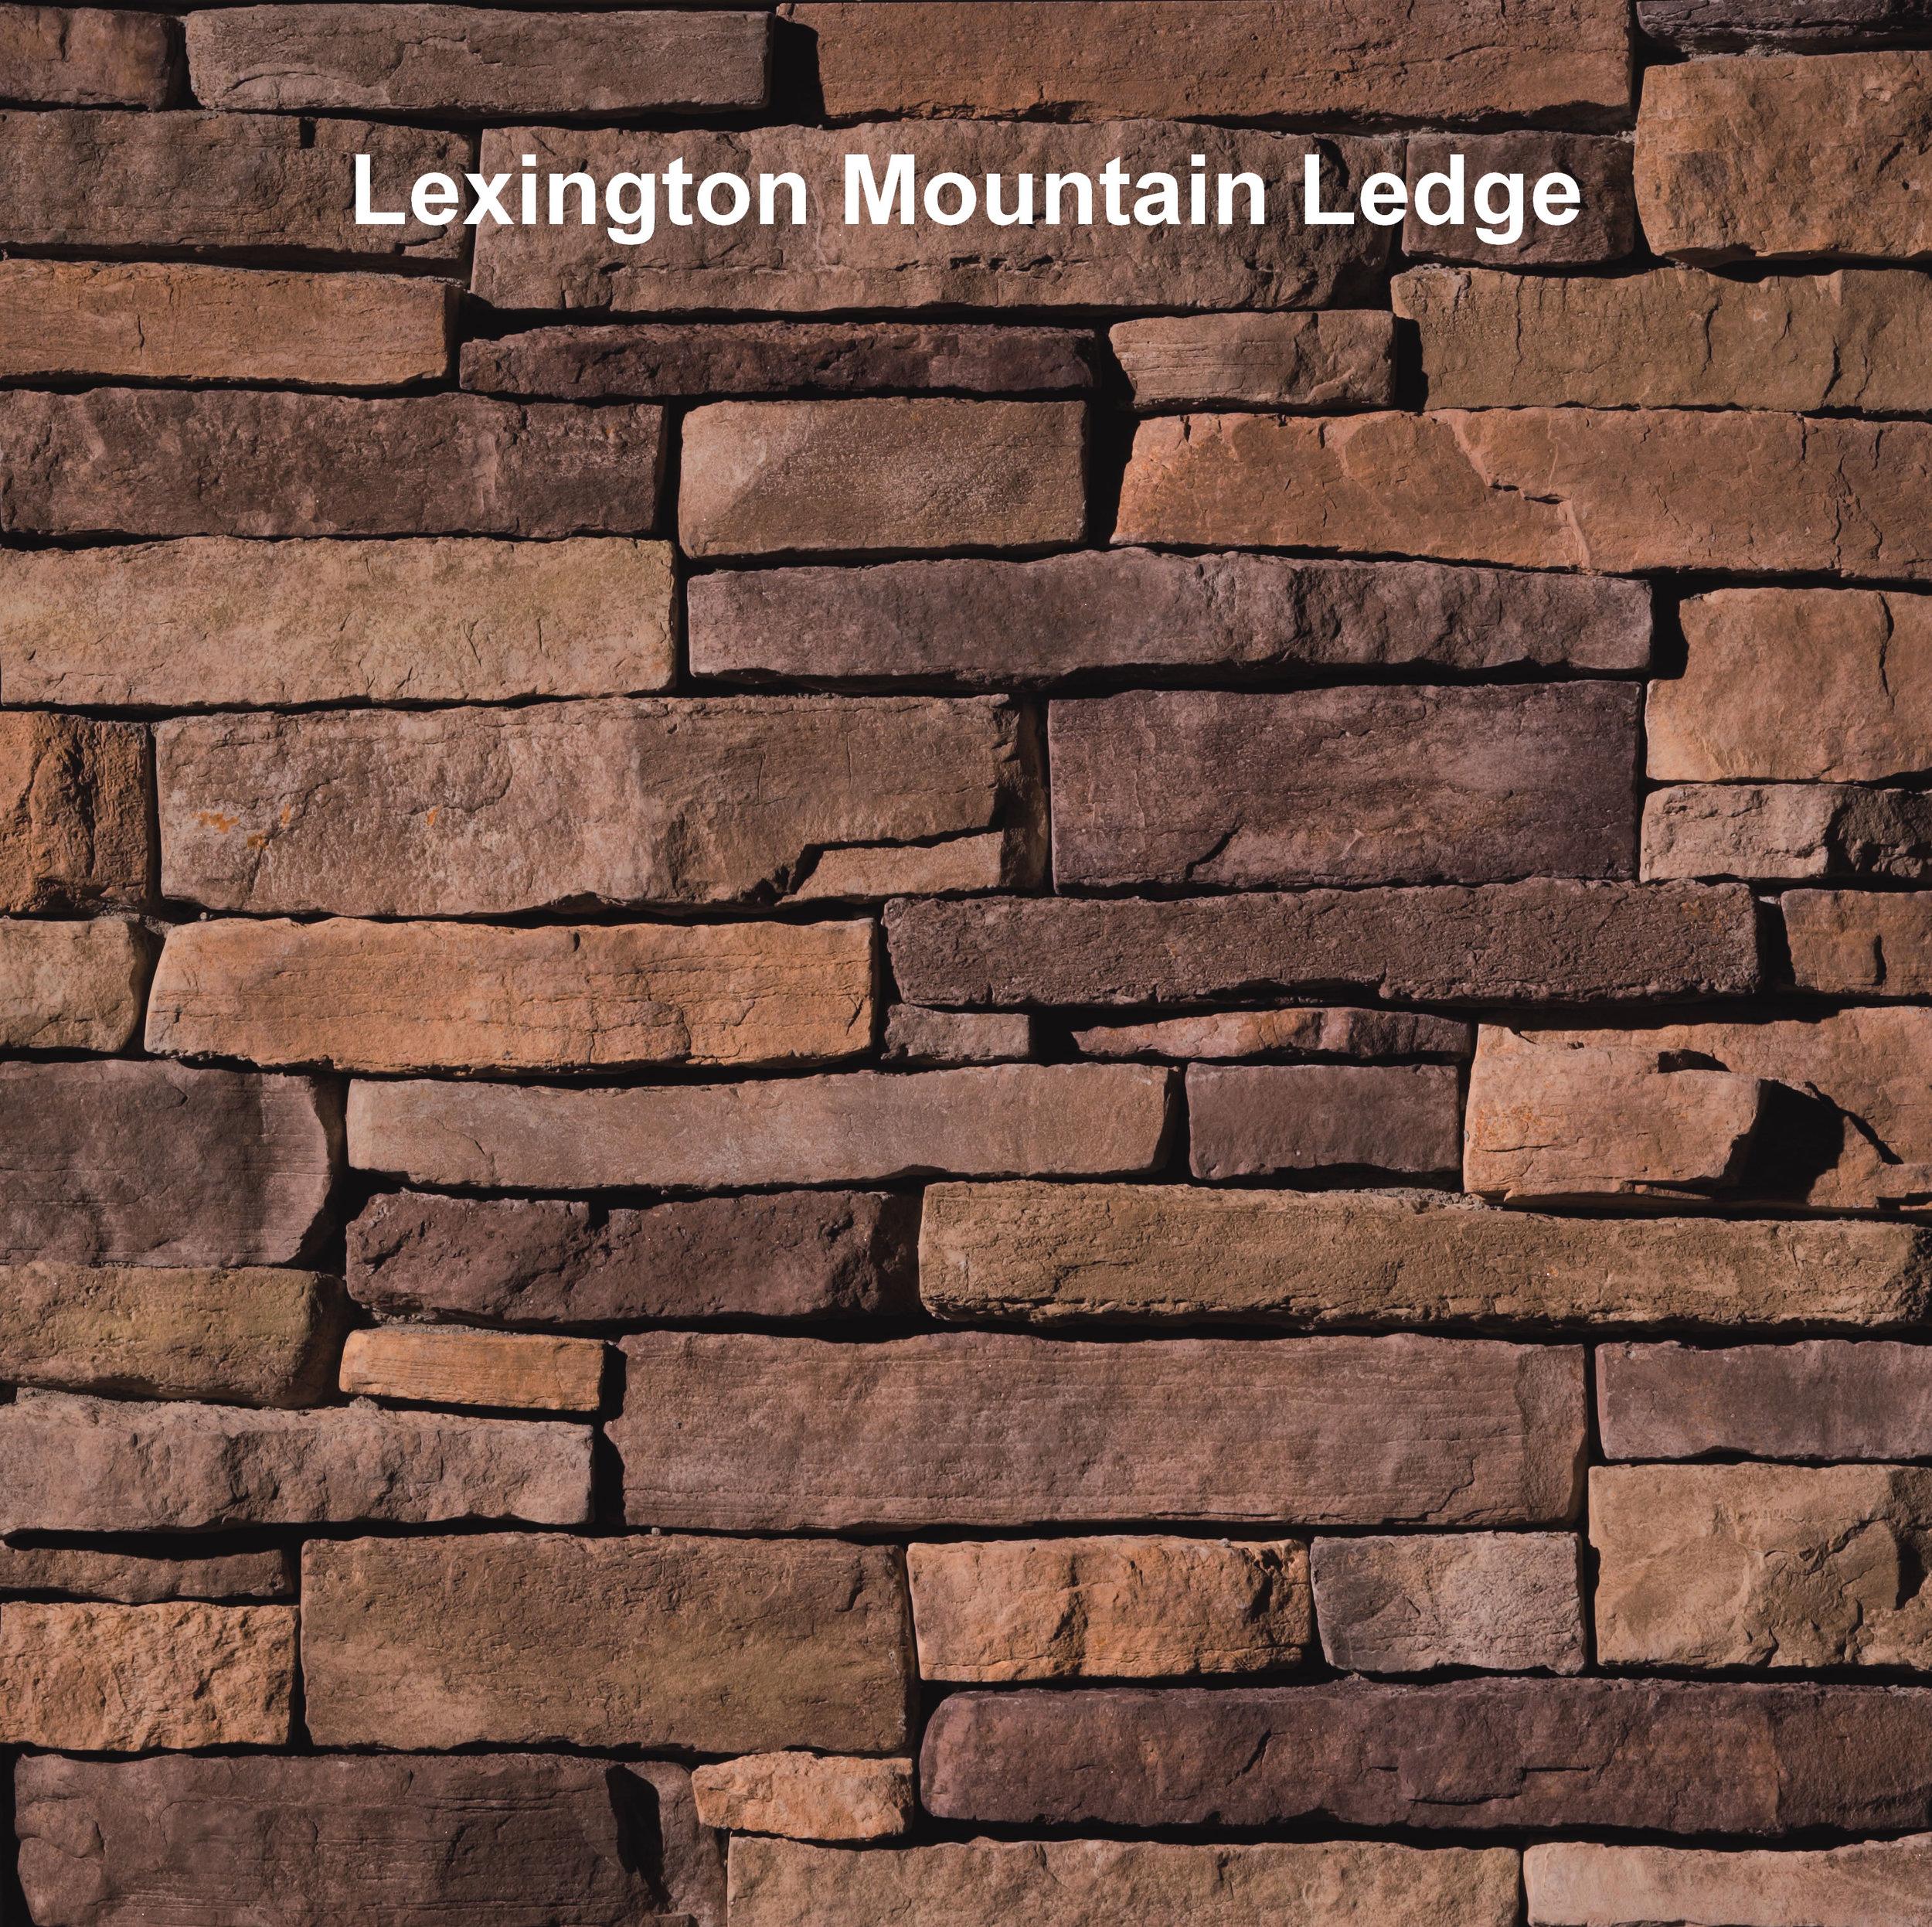 ES_Mountain Ledge_Lexington_profile_east.jpg